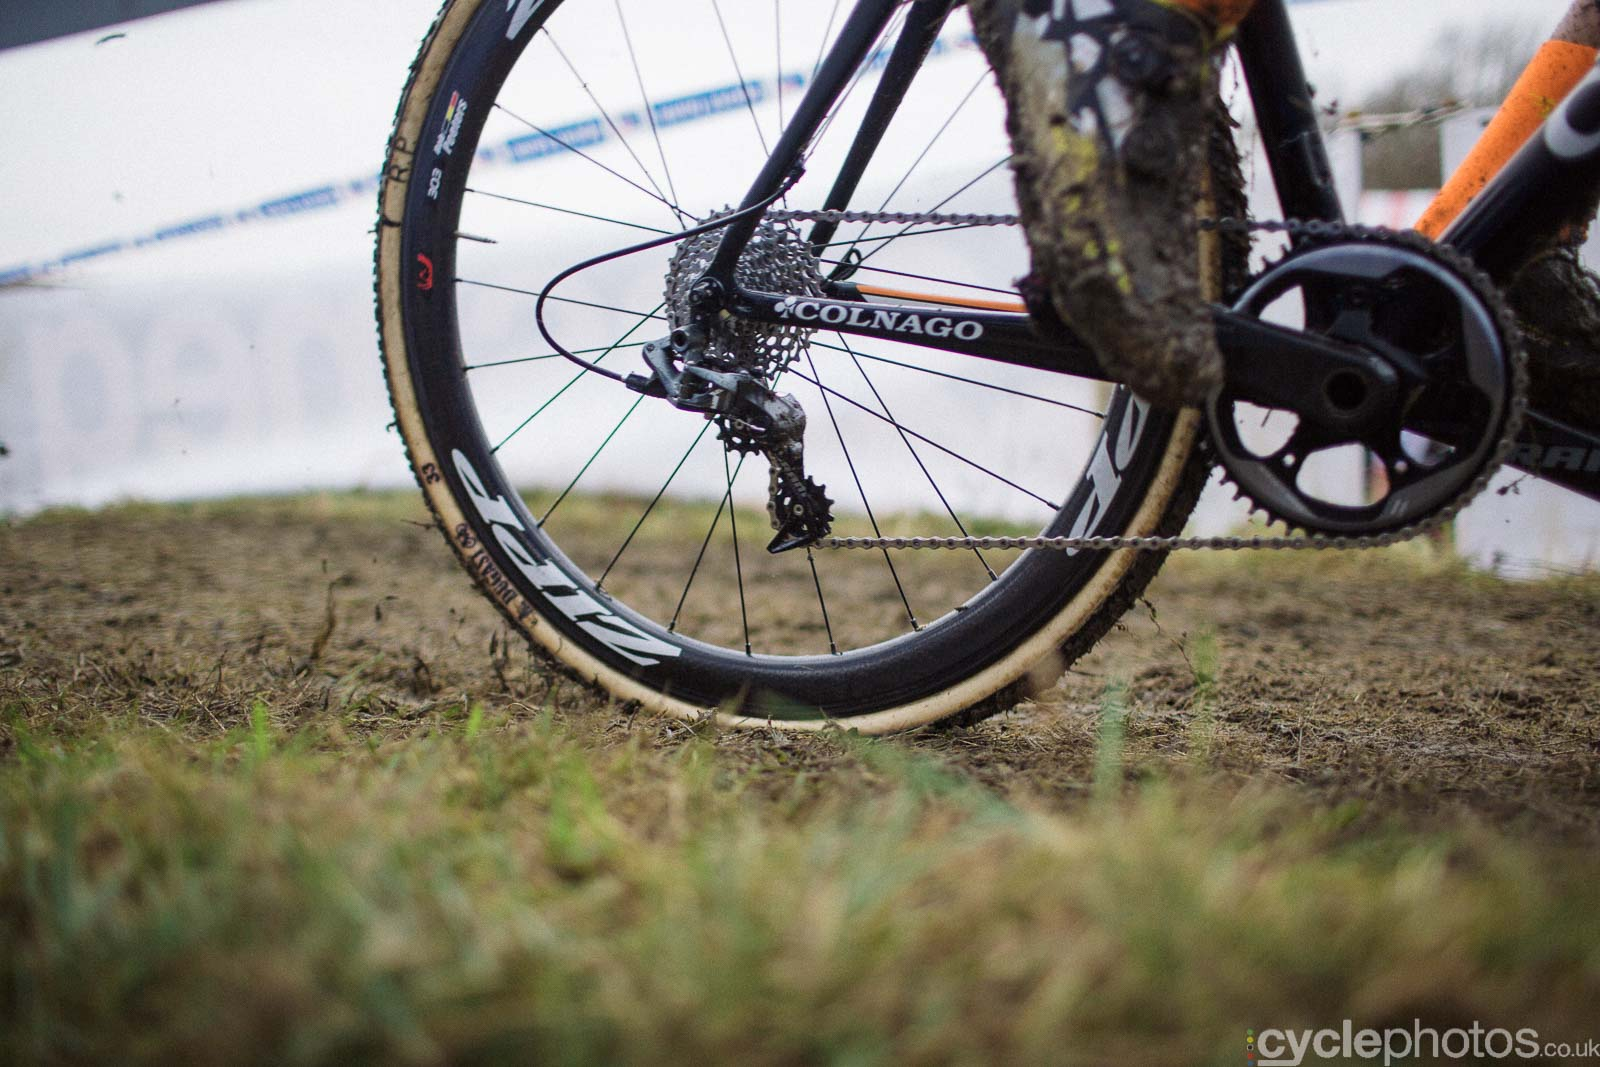 2016-cyclephotos-cyclocross-gpsvennys-151420-drivetrain